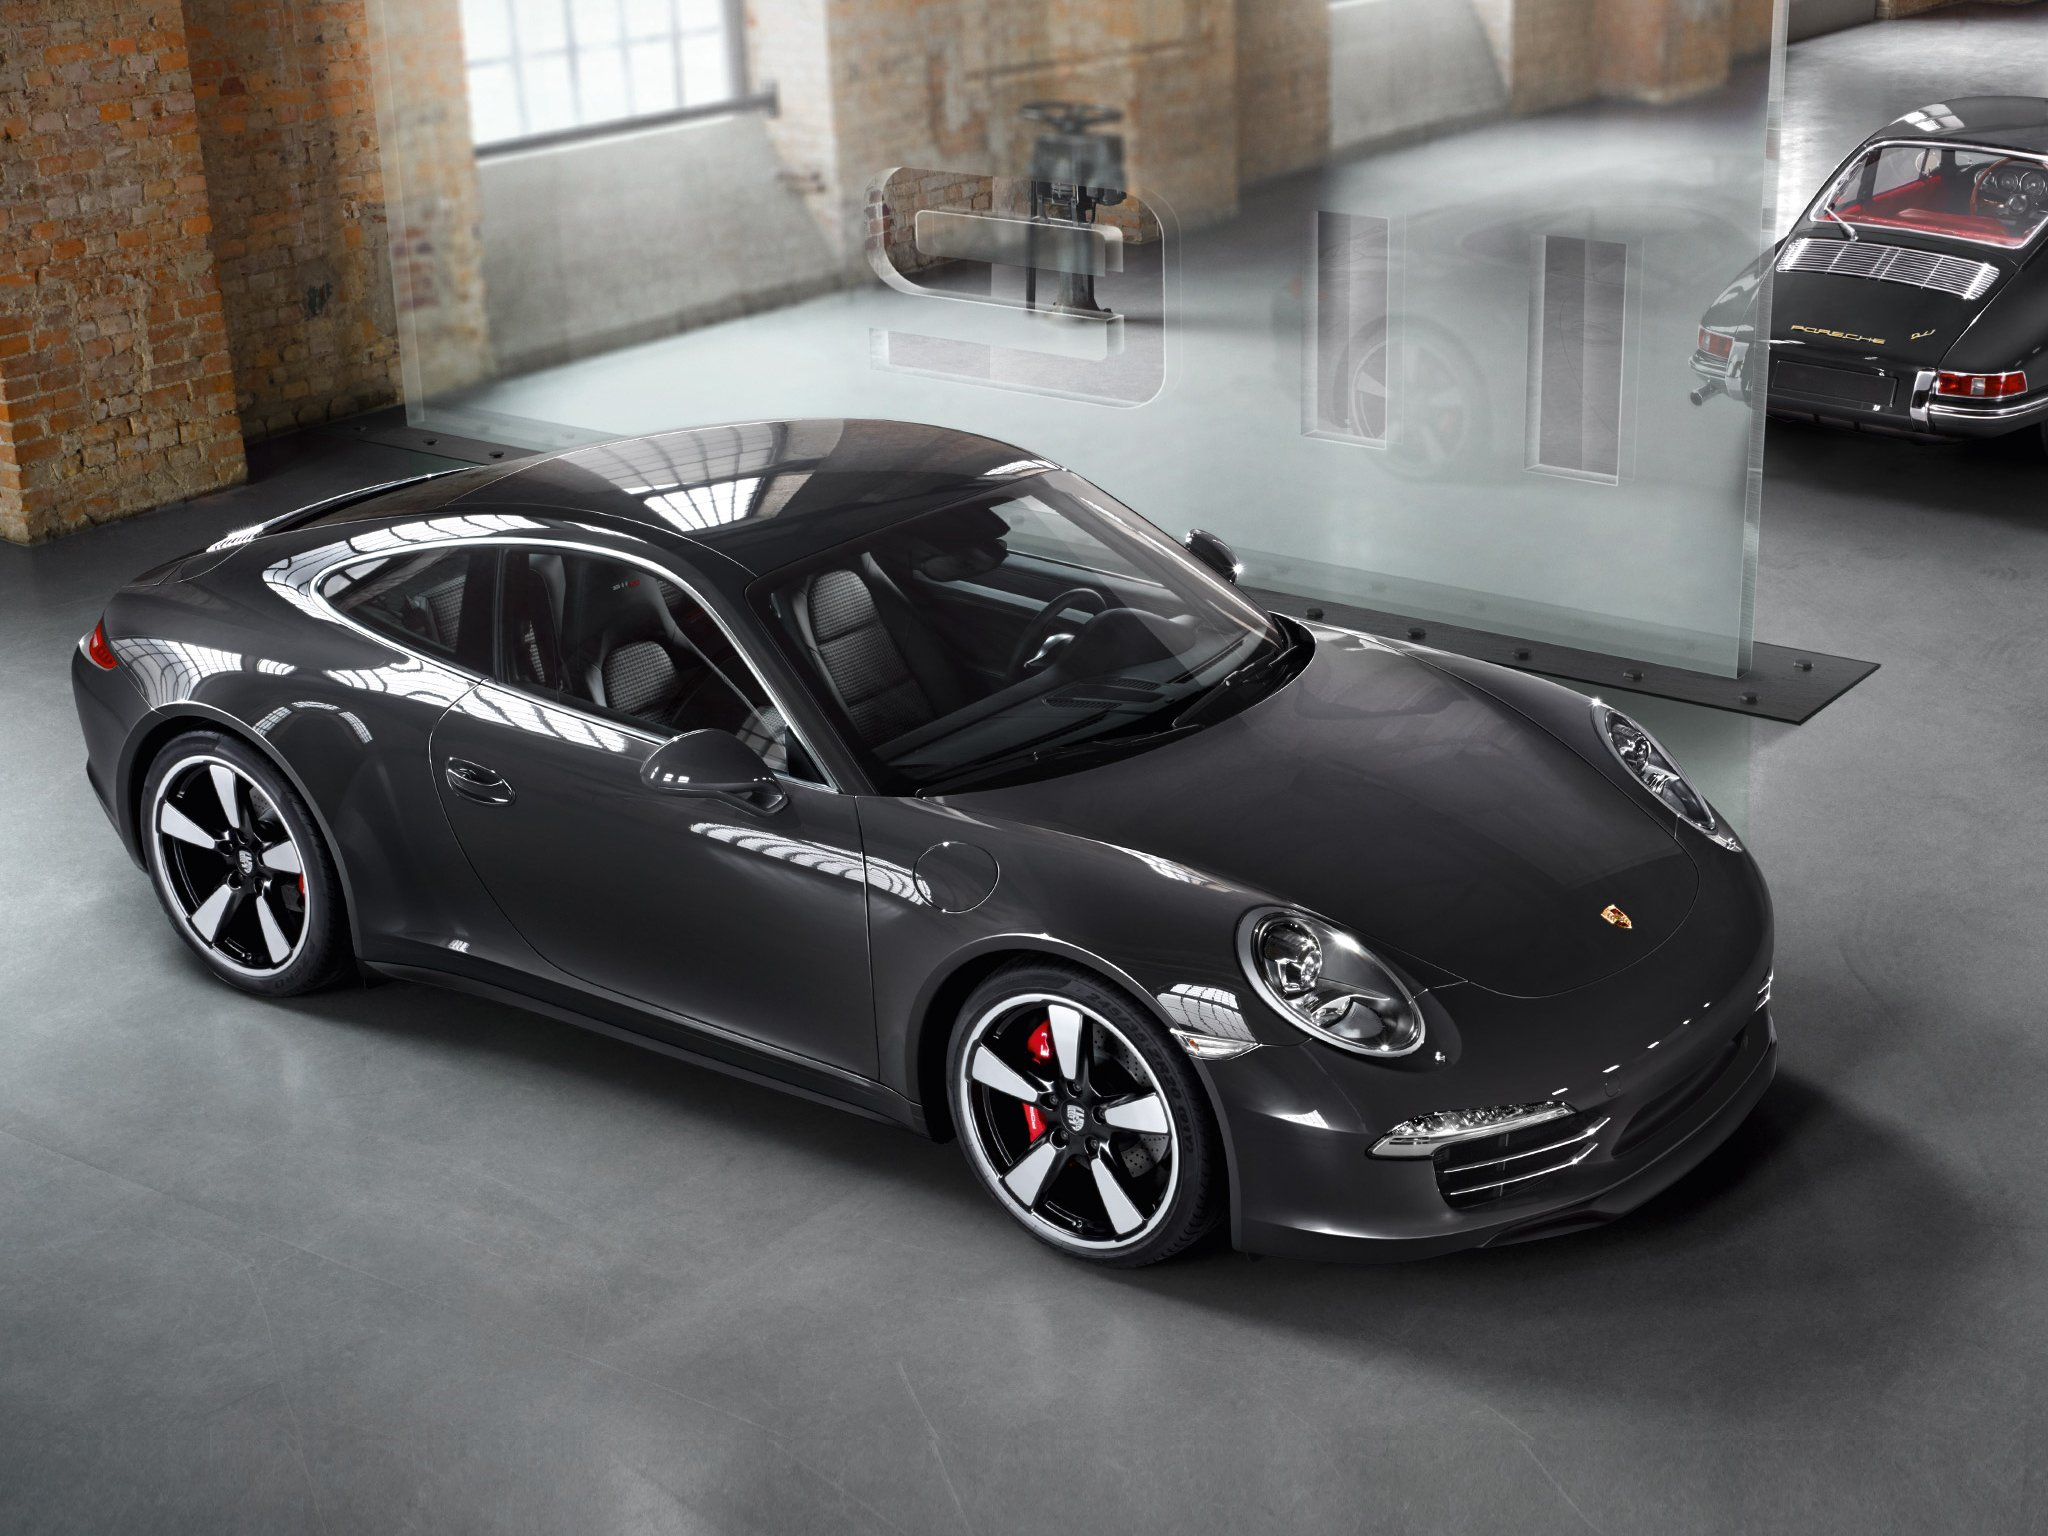 2014 Porsche 911 Carrera 50 Years Edition 991 Supercar F